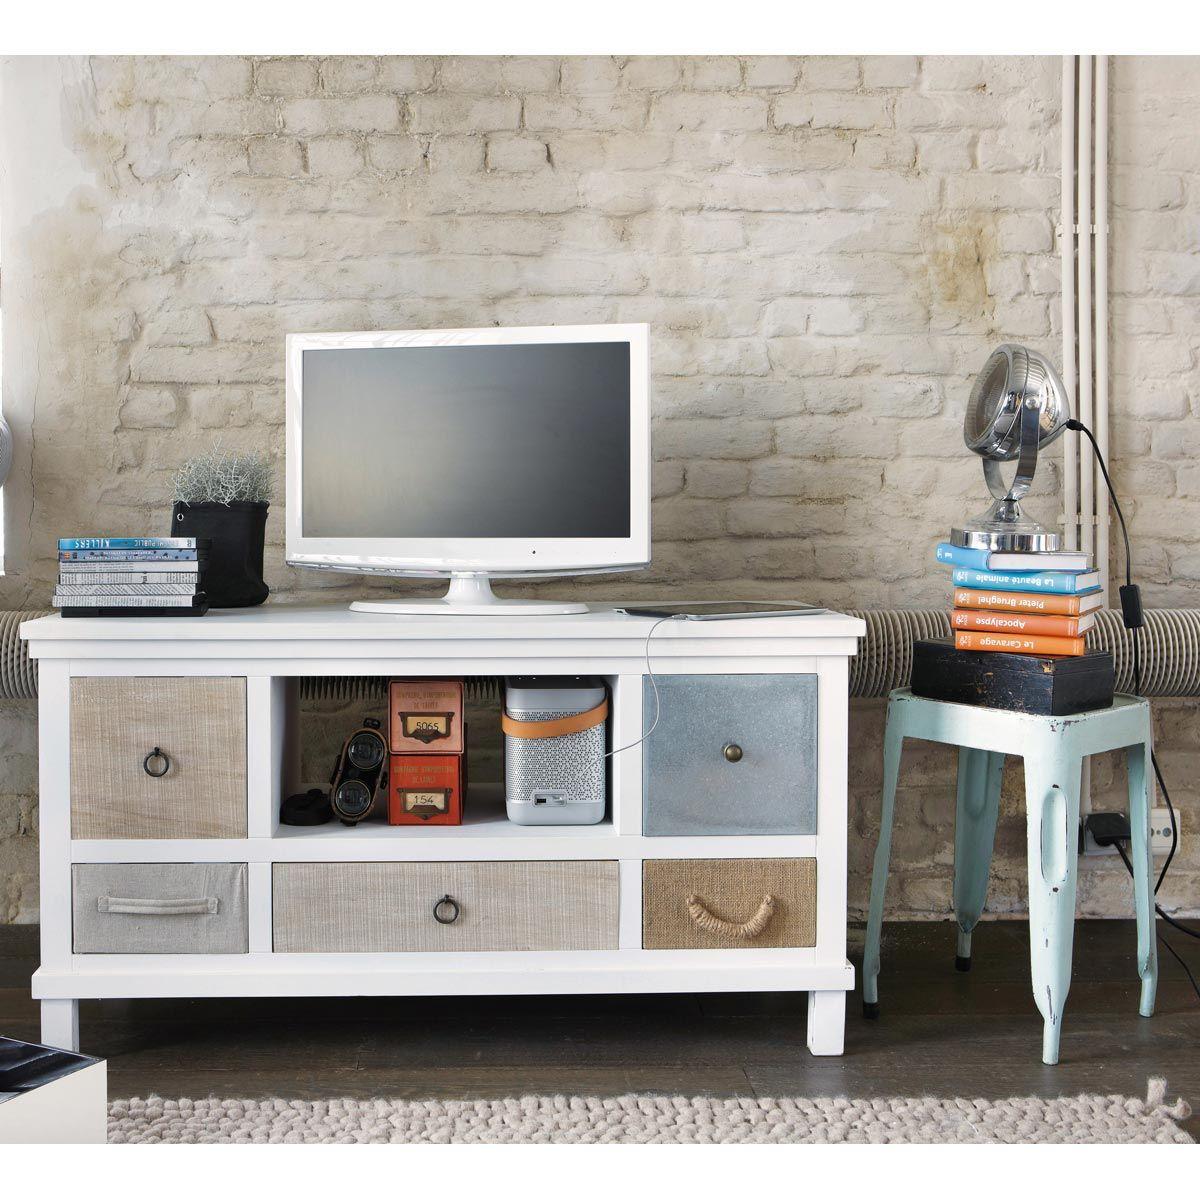 Meuble Tv En Bois Blanc L 110 Cm Meuble Tv Blanc Meuble Tv Et  # Meuble Tv Paulownia Blanc